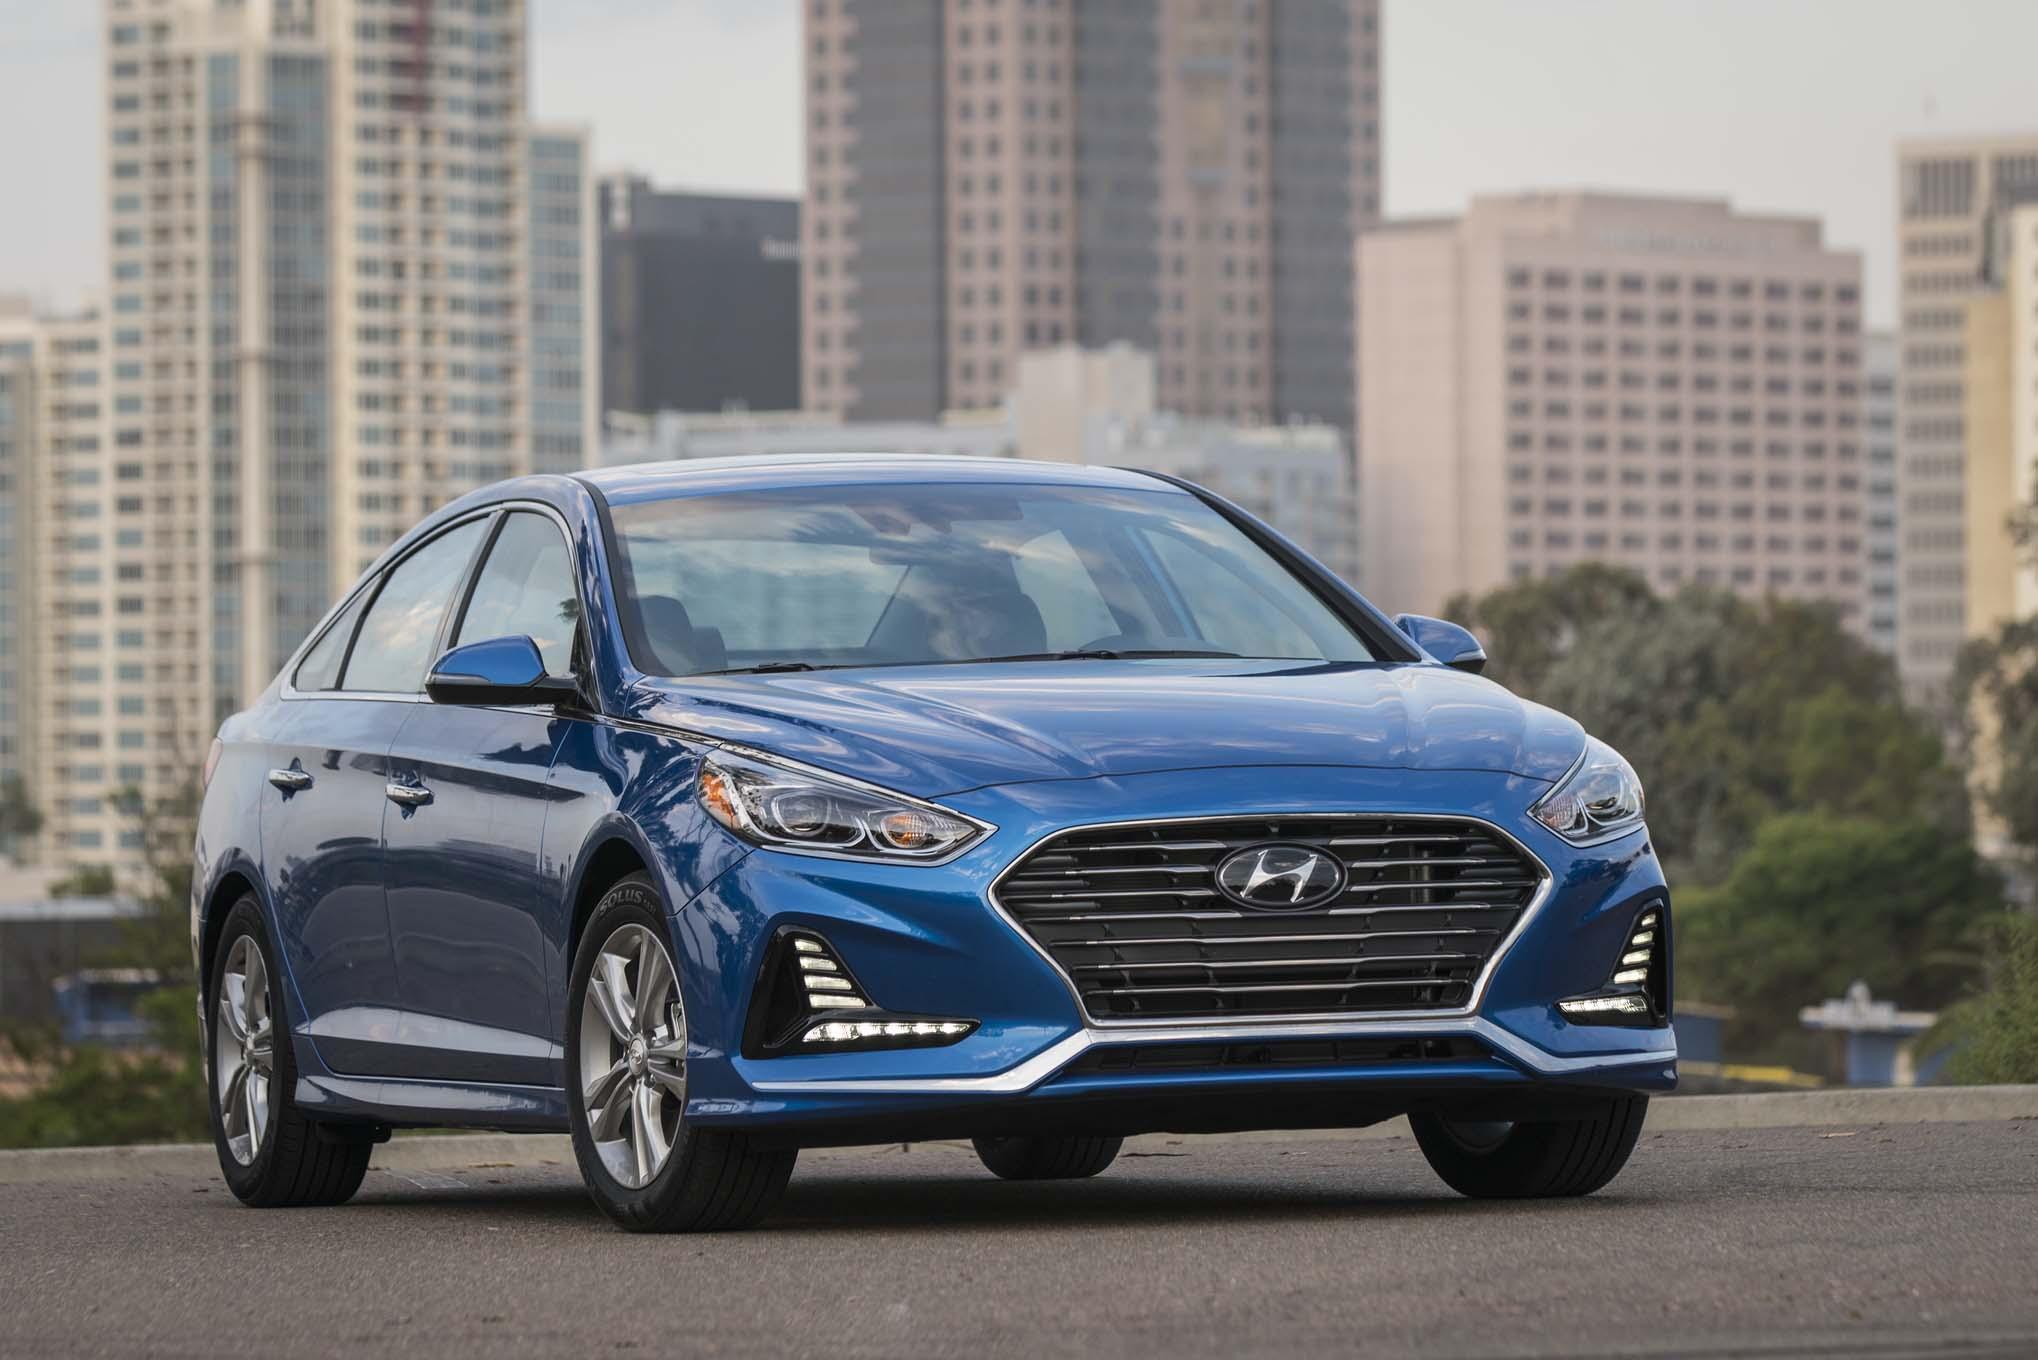 Hyundai Sonata Mpg U003eu003e Three Things We Love About The 2018 Hyundai Sonata  Limited |